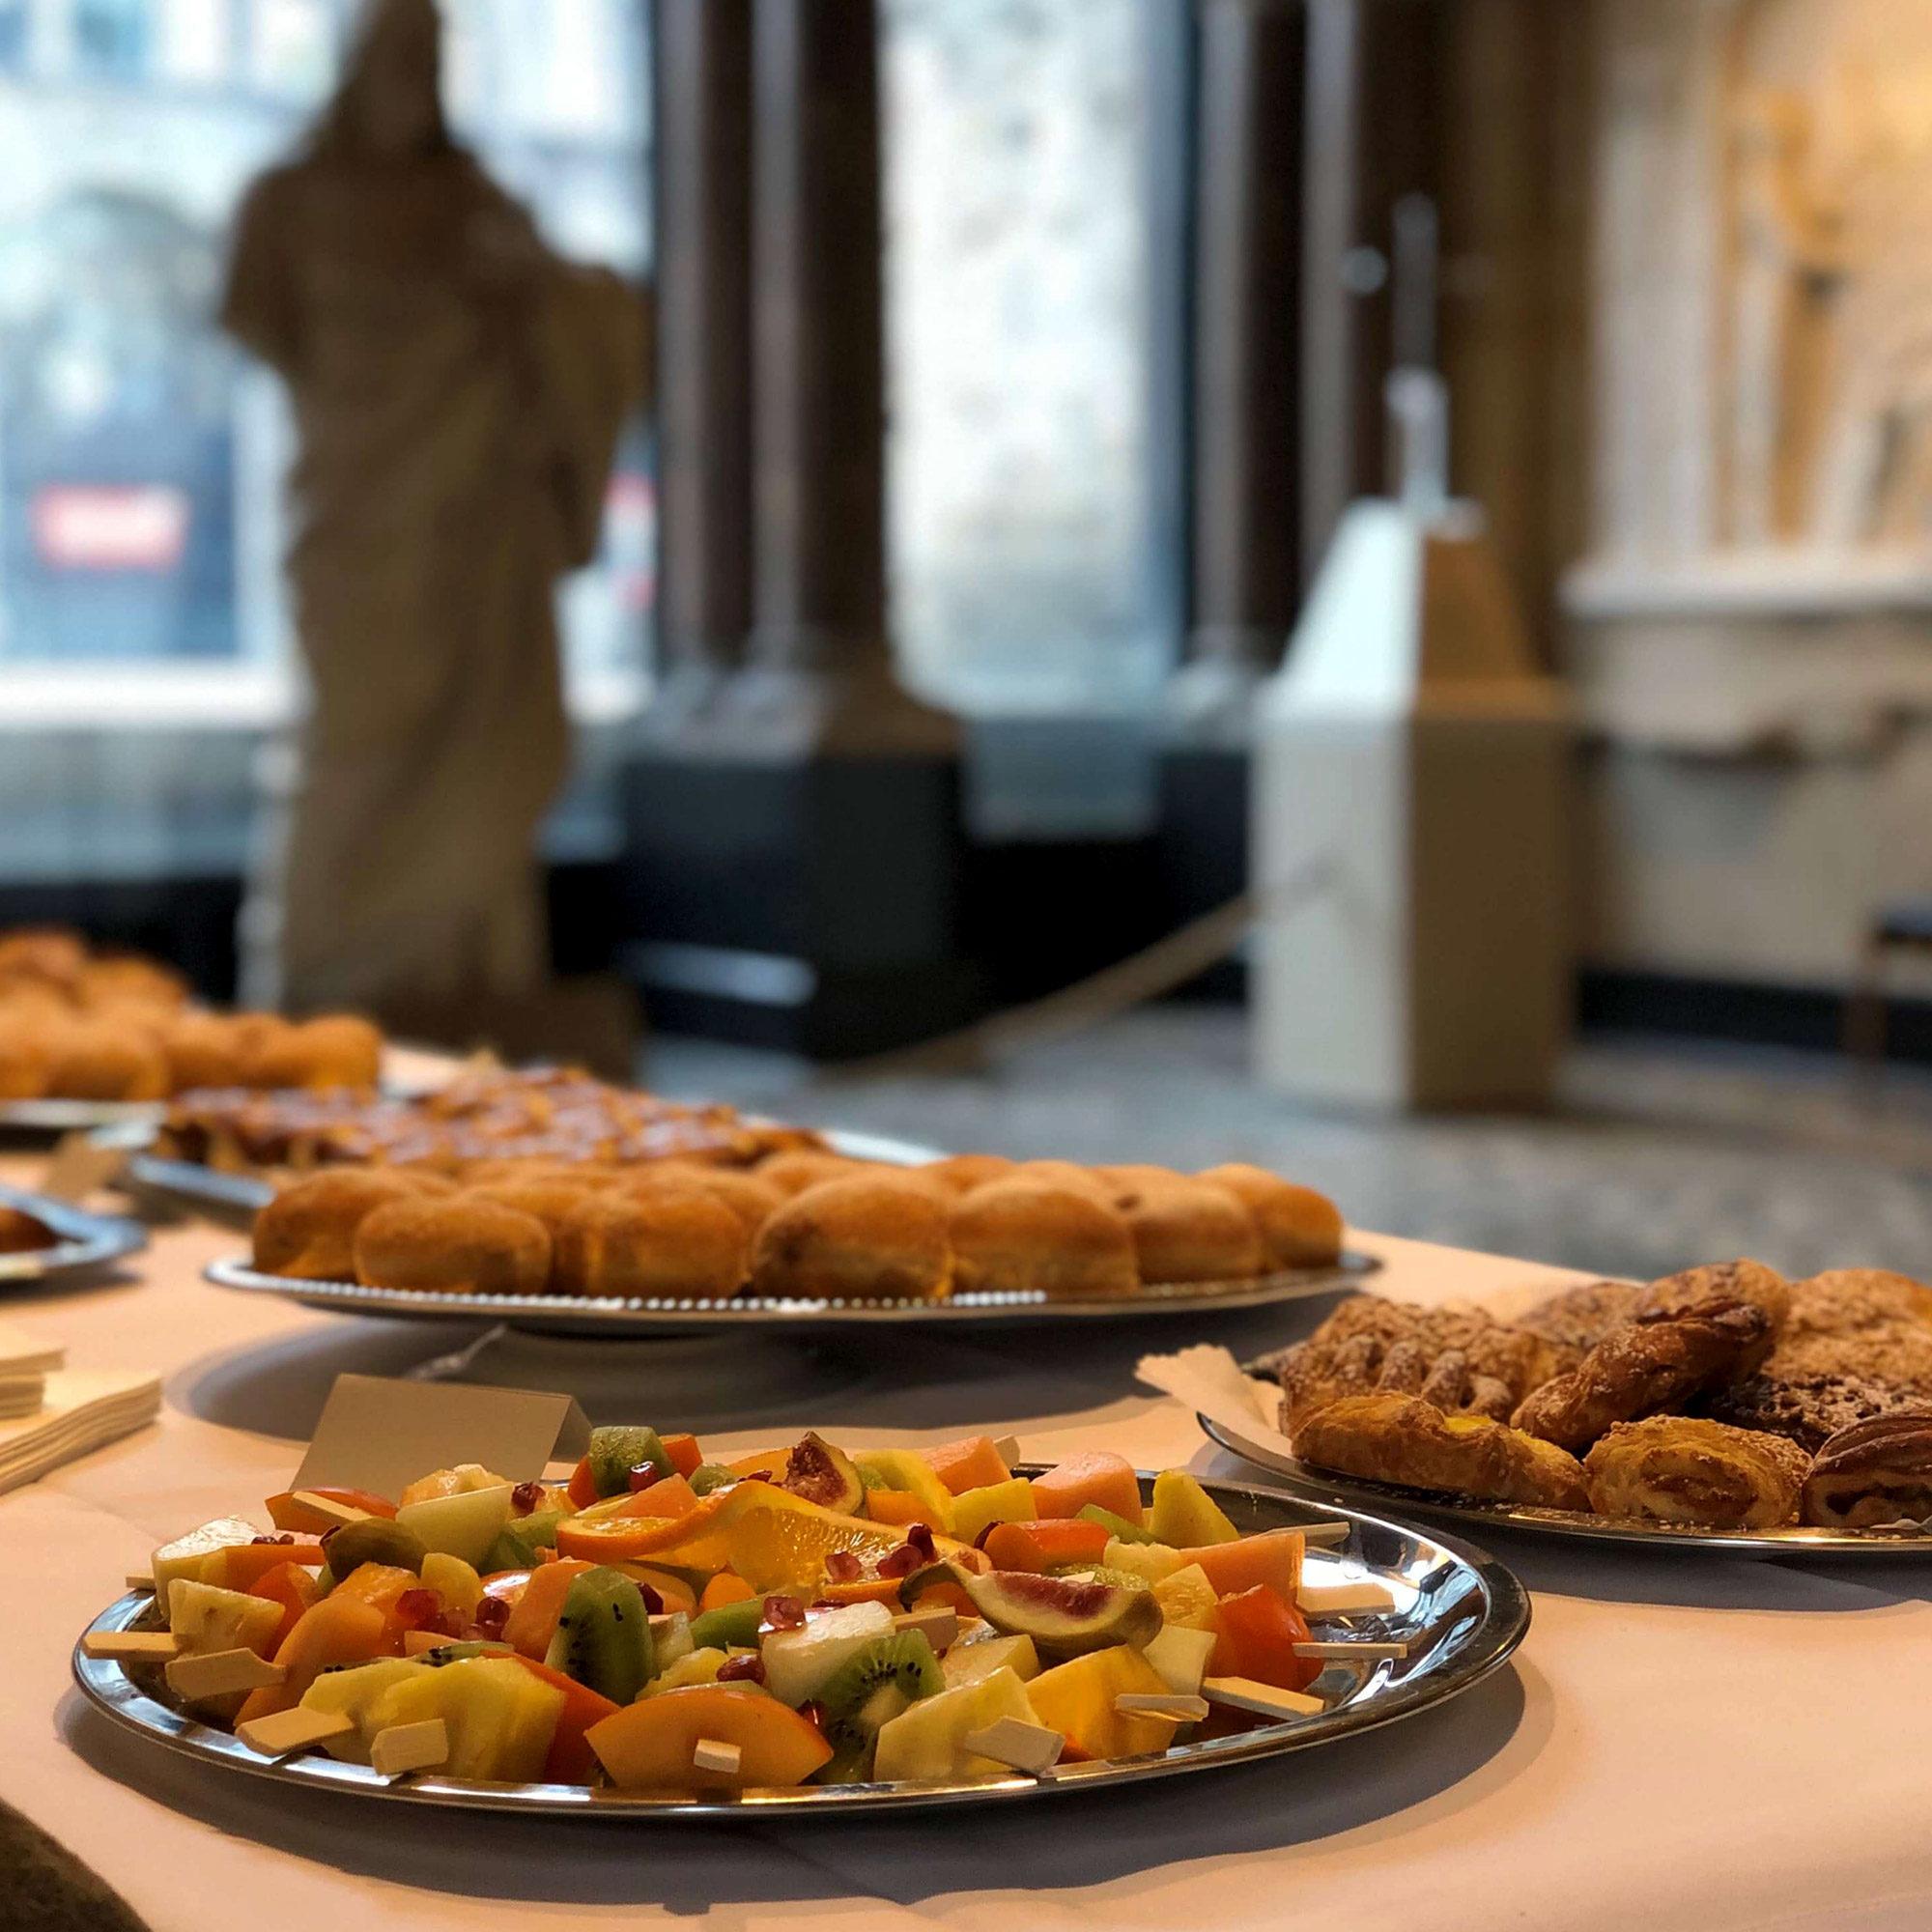 Gedaechtniskriche Gedenkfeier - Butterstulle Catering Berlin